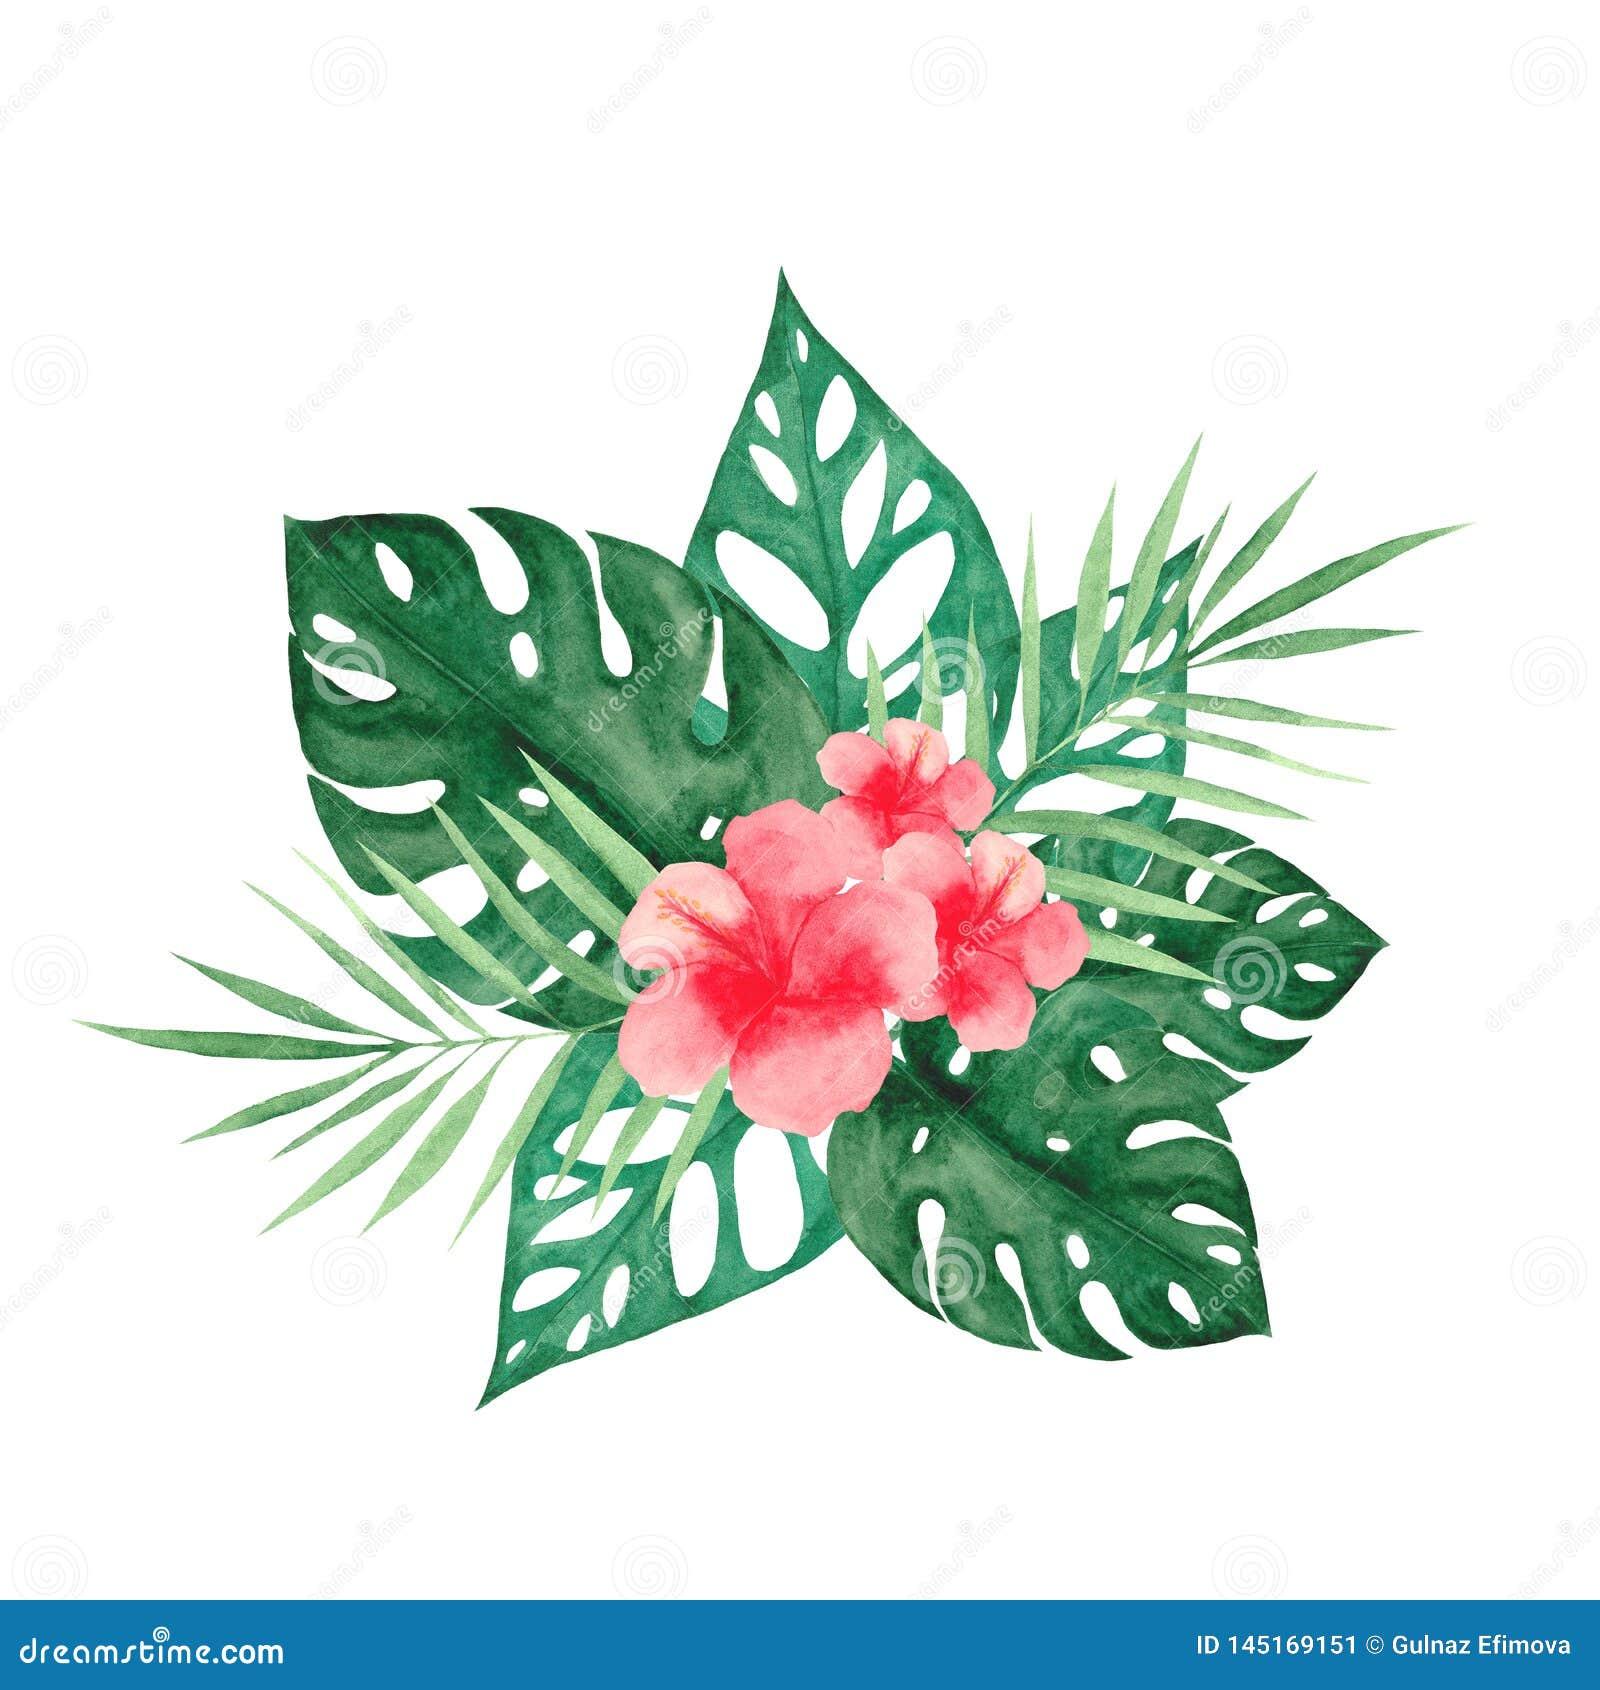 Watercolor που τίθεται με τα τροπικά φύλλα και τα λουλούδια